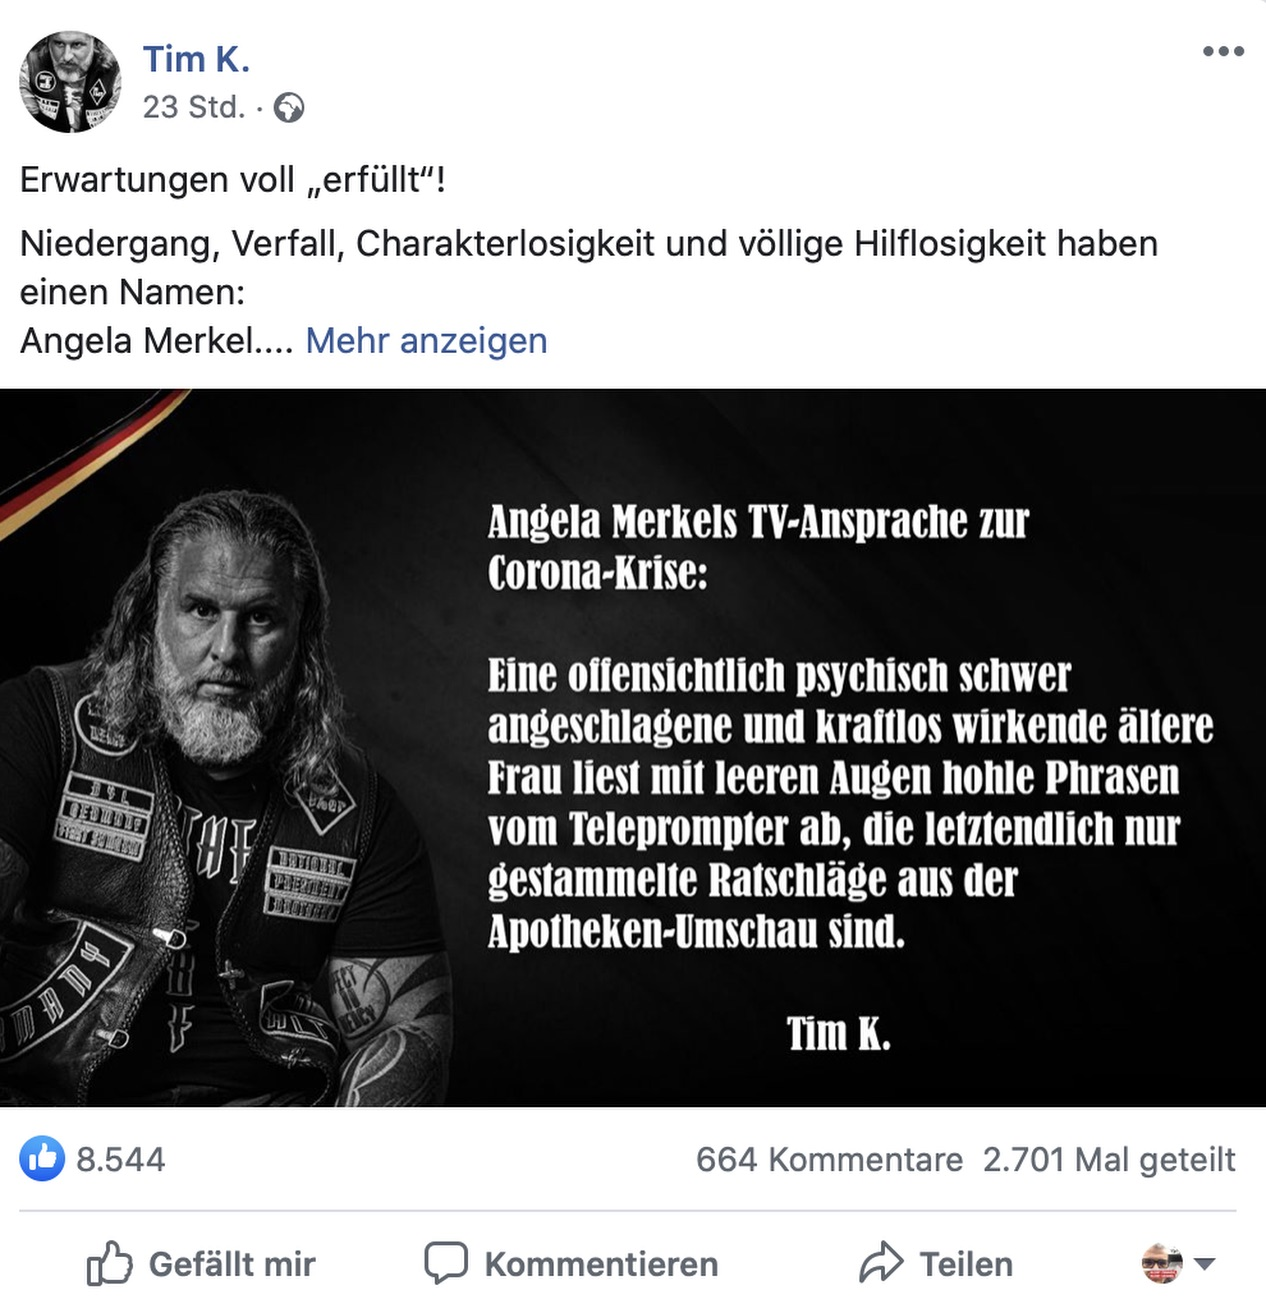 Tim K. - beliebt bei Rechtsradikalen und Verschwörungstheoretikern; Screenshot Facebook